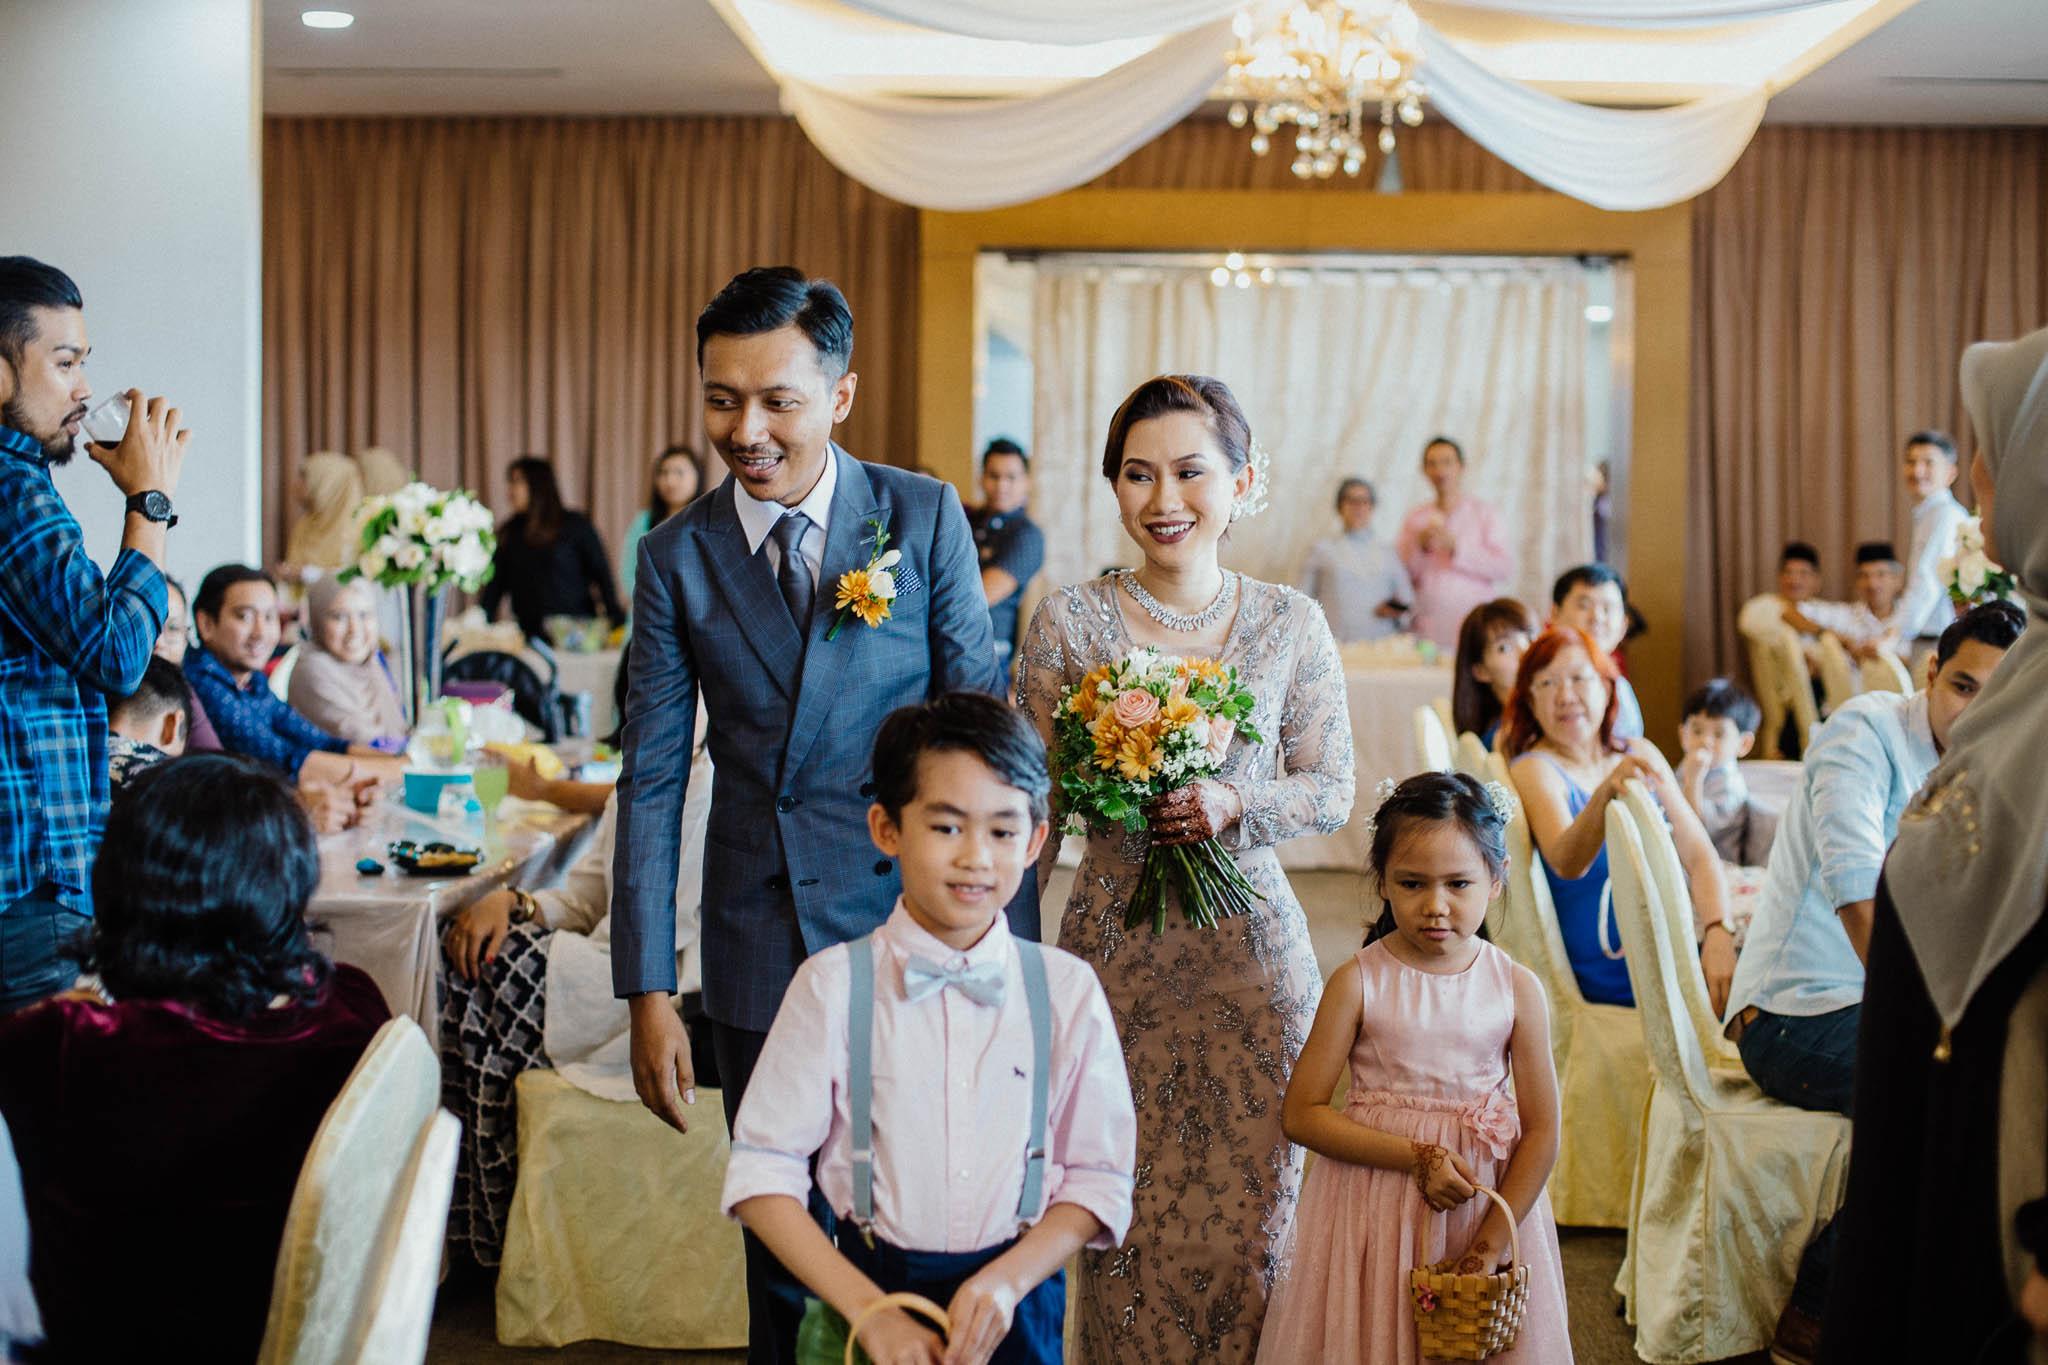 singapore-wedding-photographer-wedding-nufail-addafiq-048.jpg